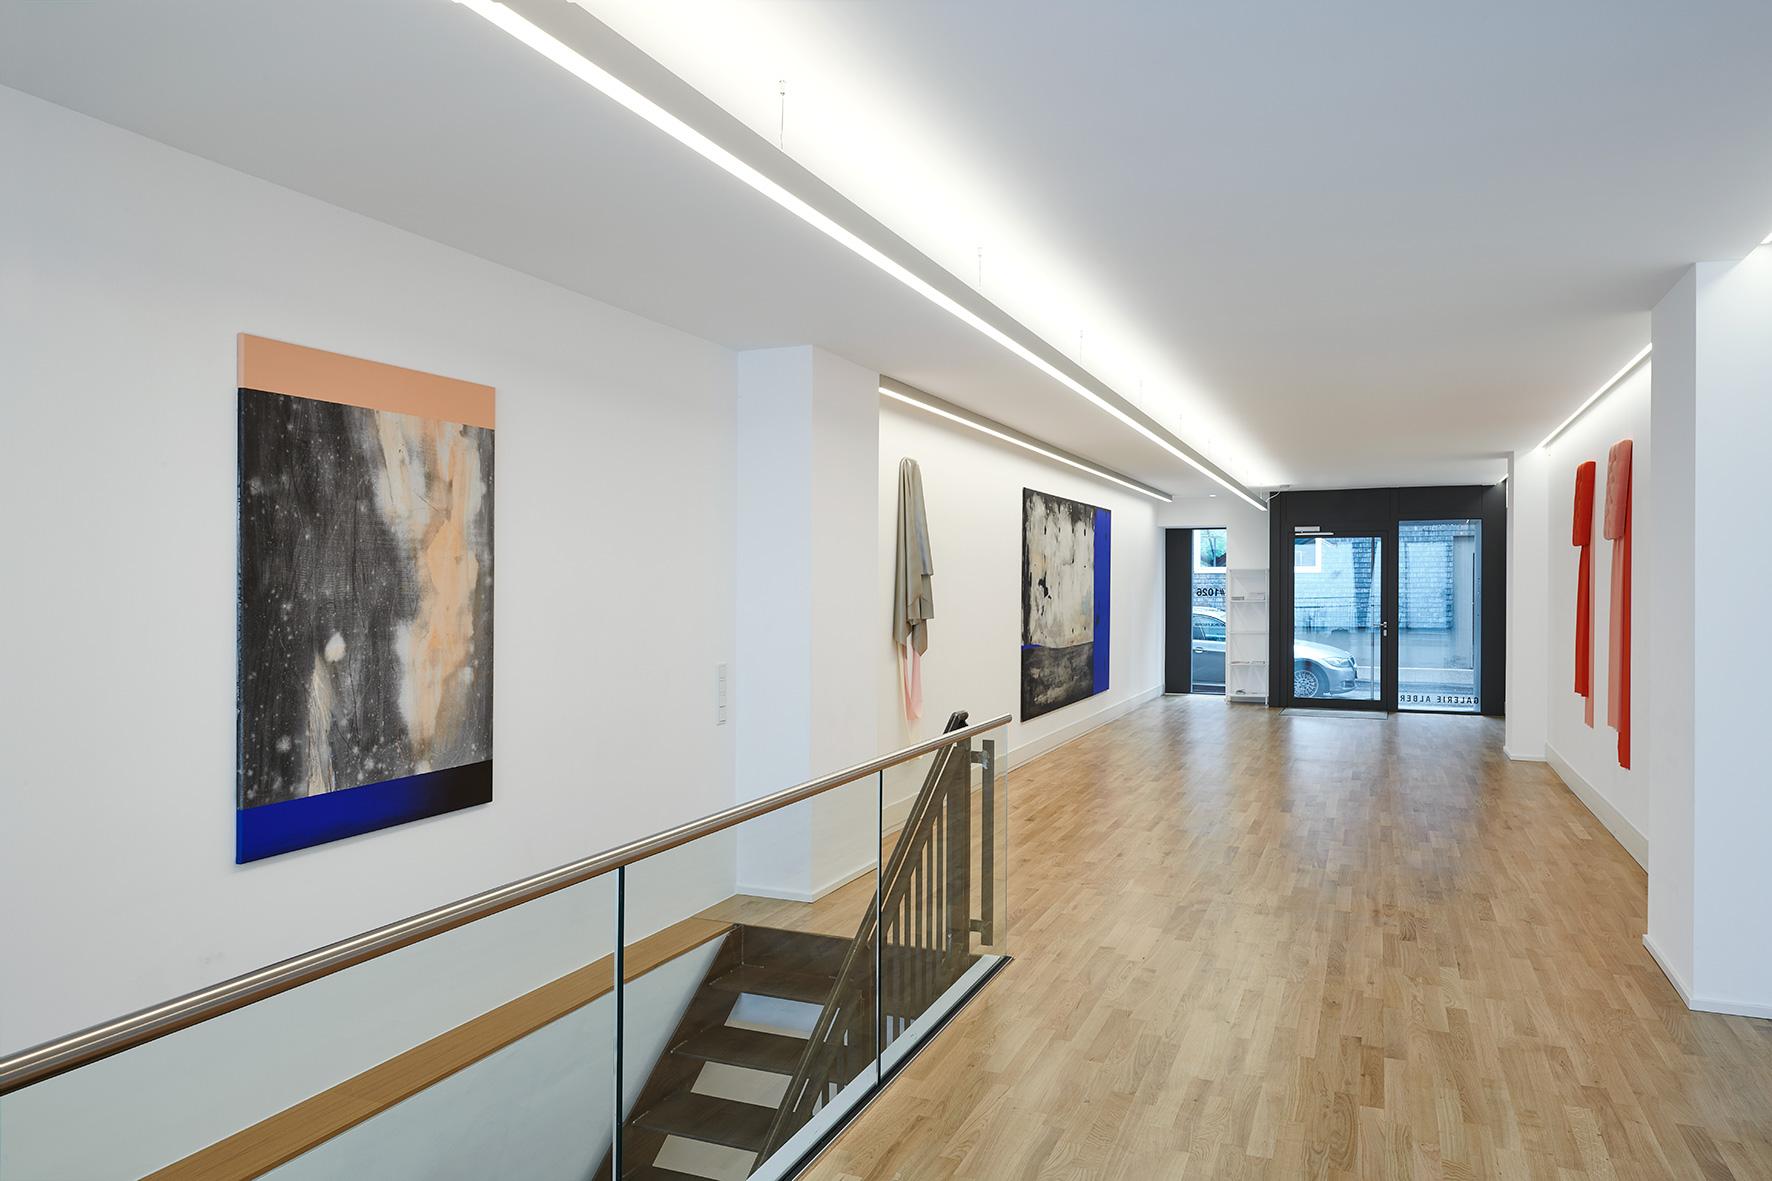 2019.05.08_Galerie-Alber_11.web.jpg